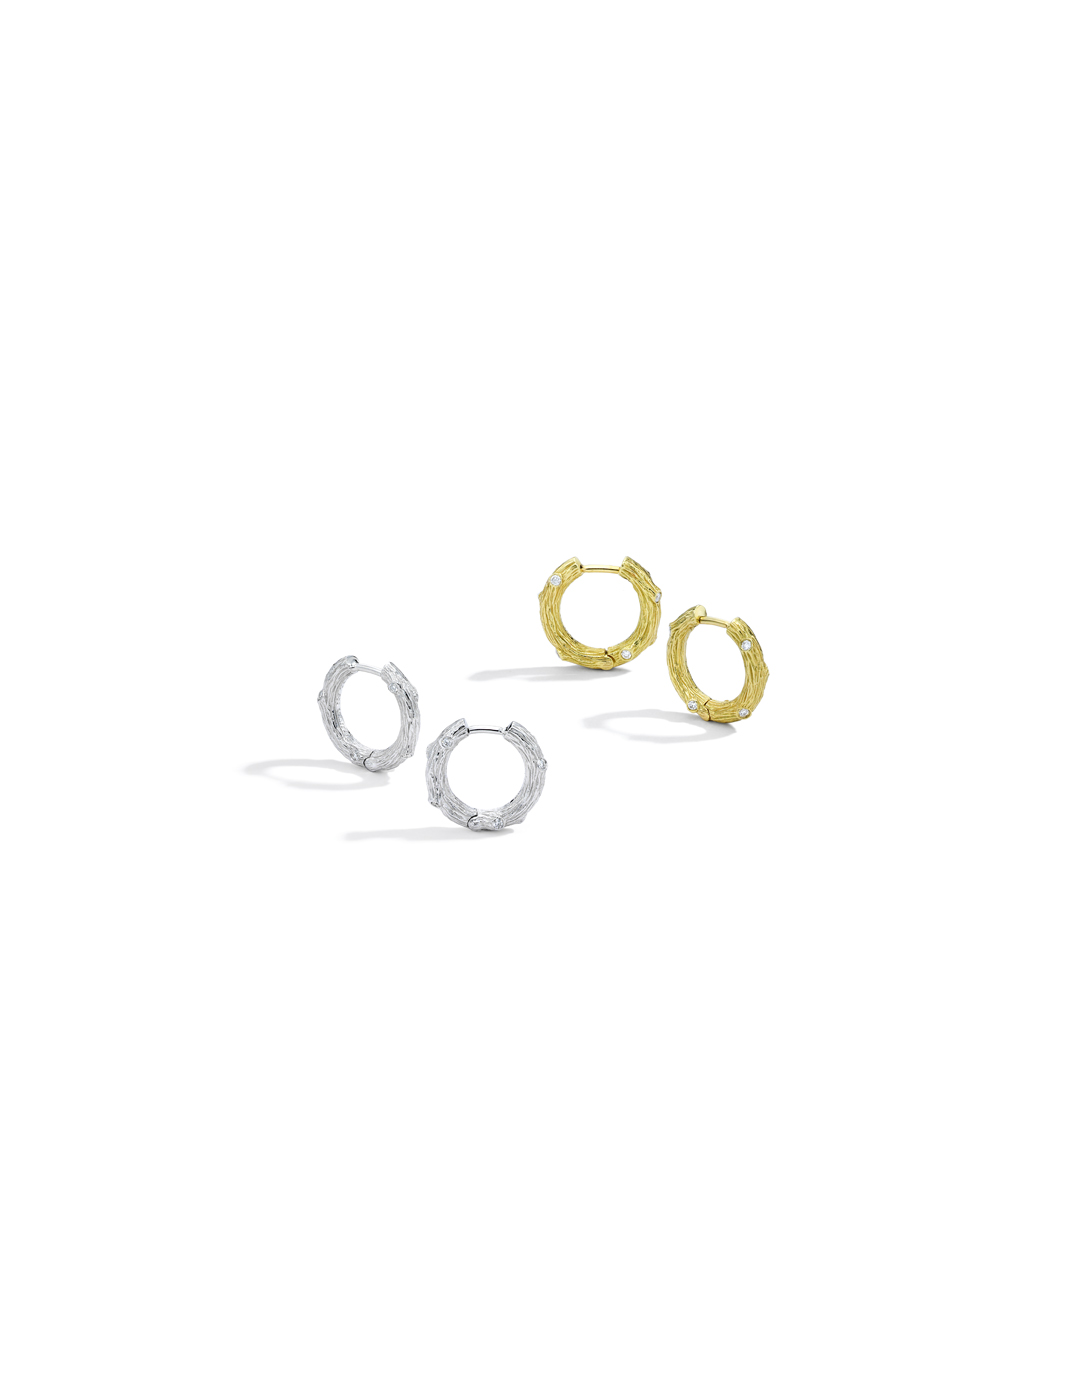 mish_products_earrings_Twig-Sml Hoop YG-ER-2